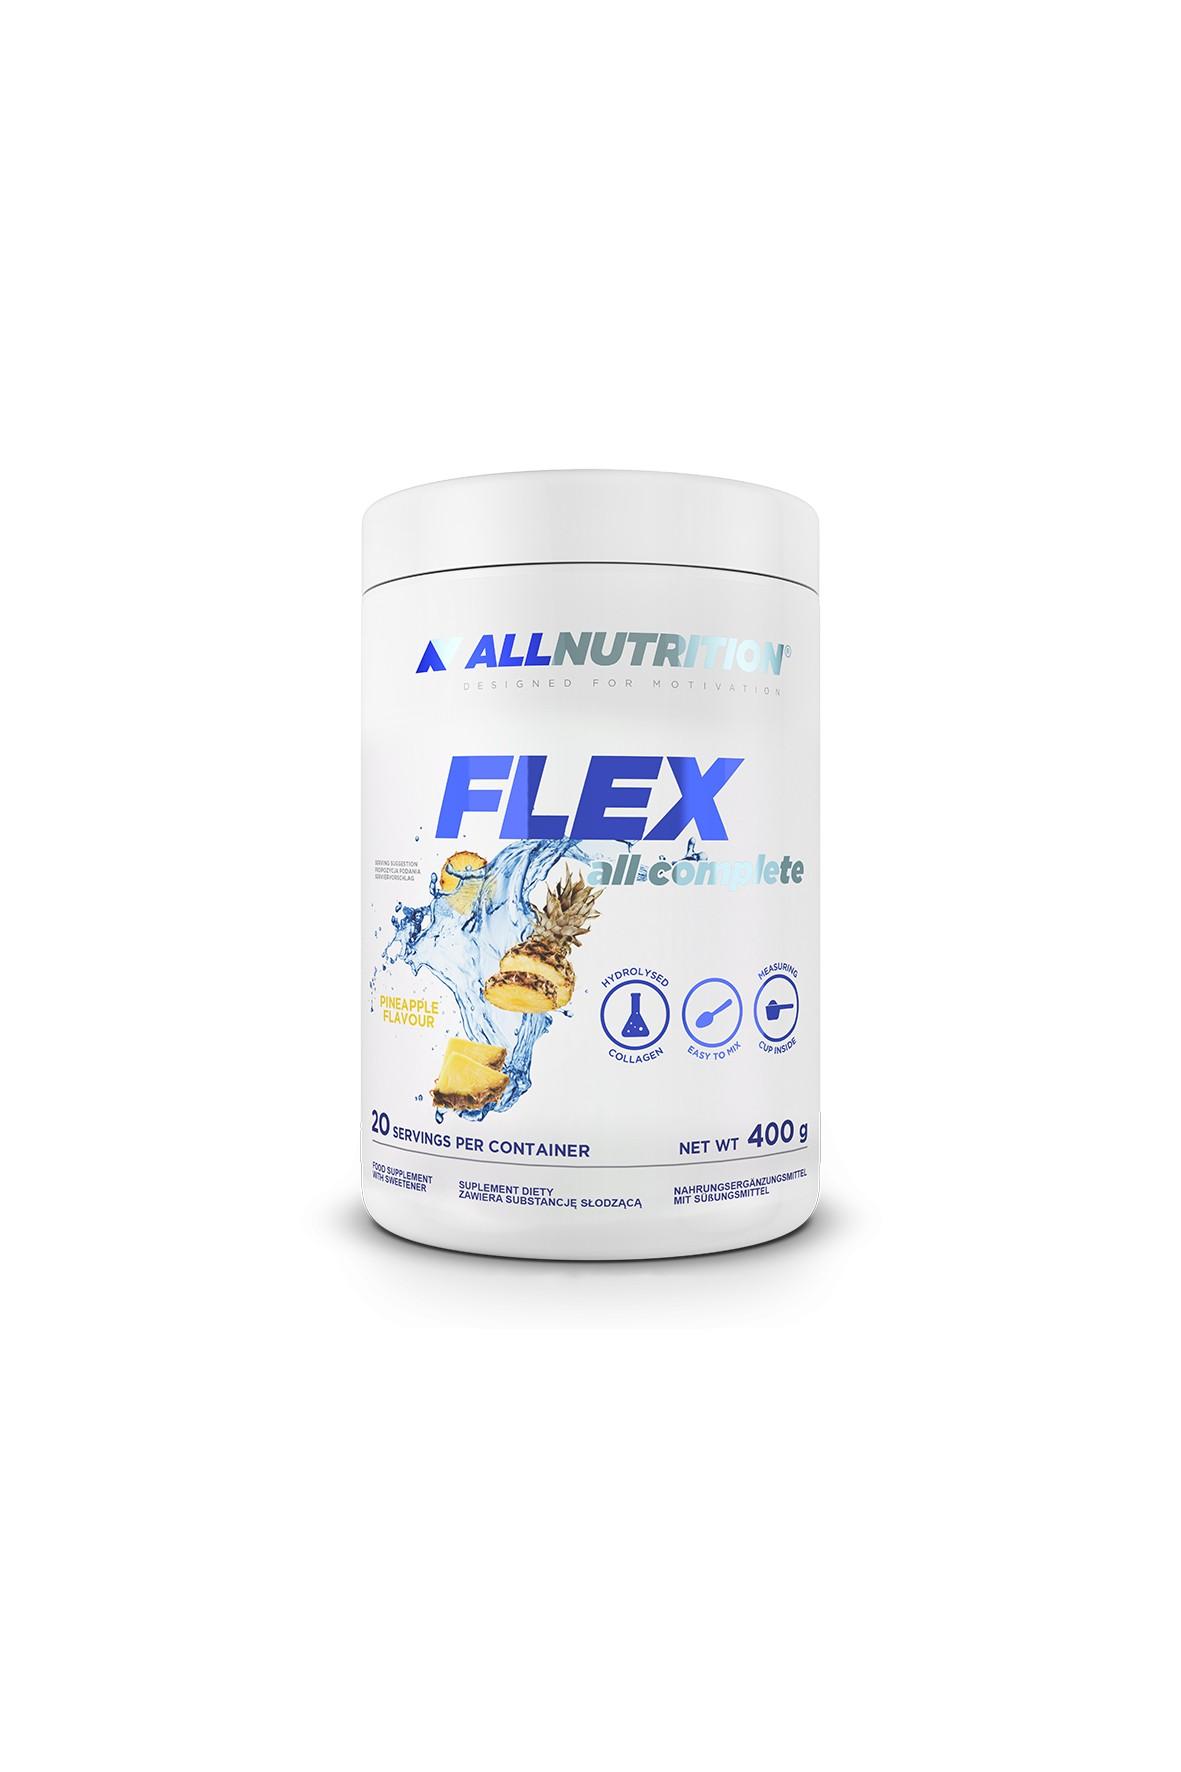 Suplementy diety - Allnutrition Flex Complete V2.0 400g Pineapple